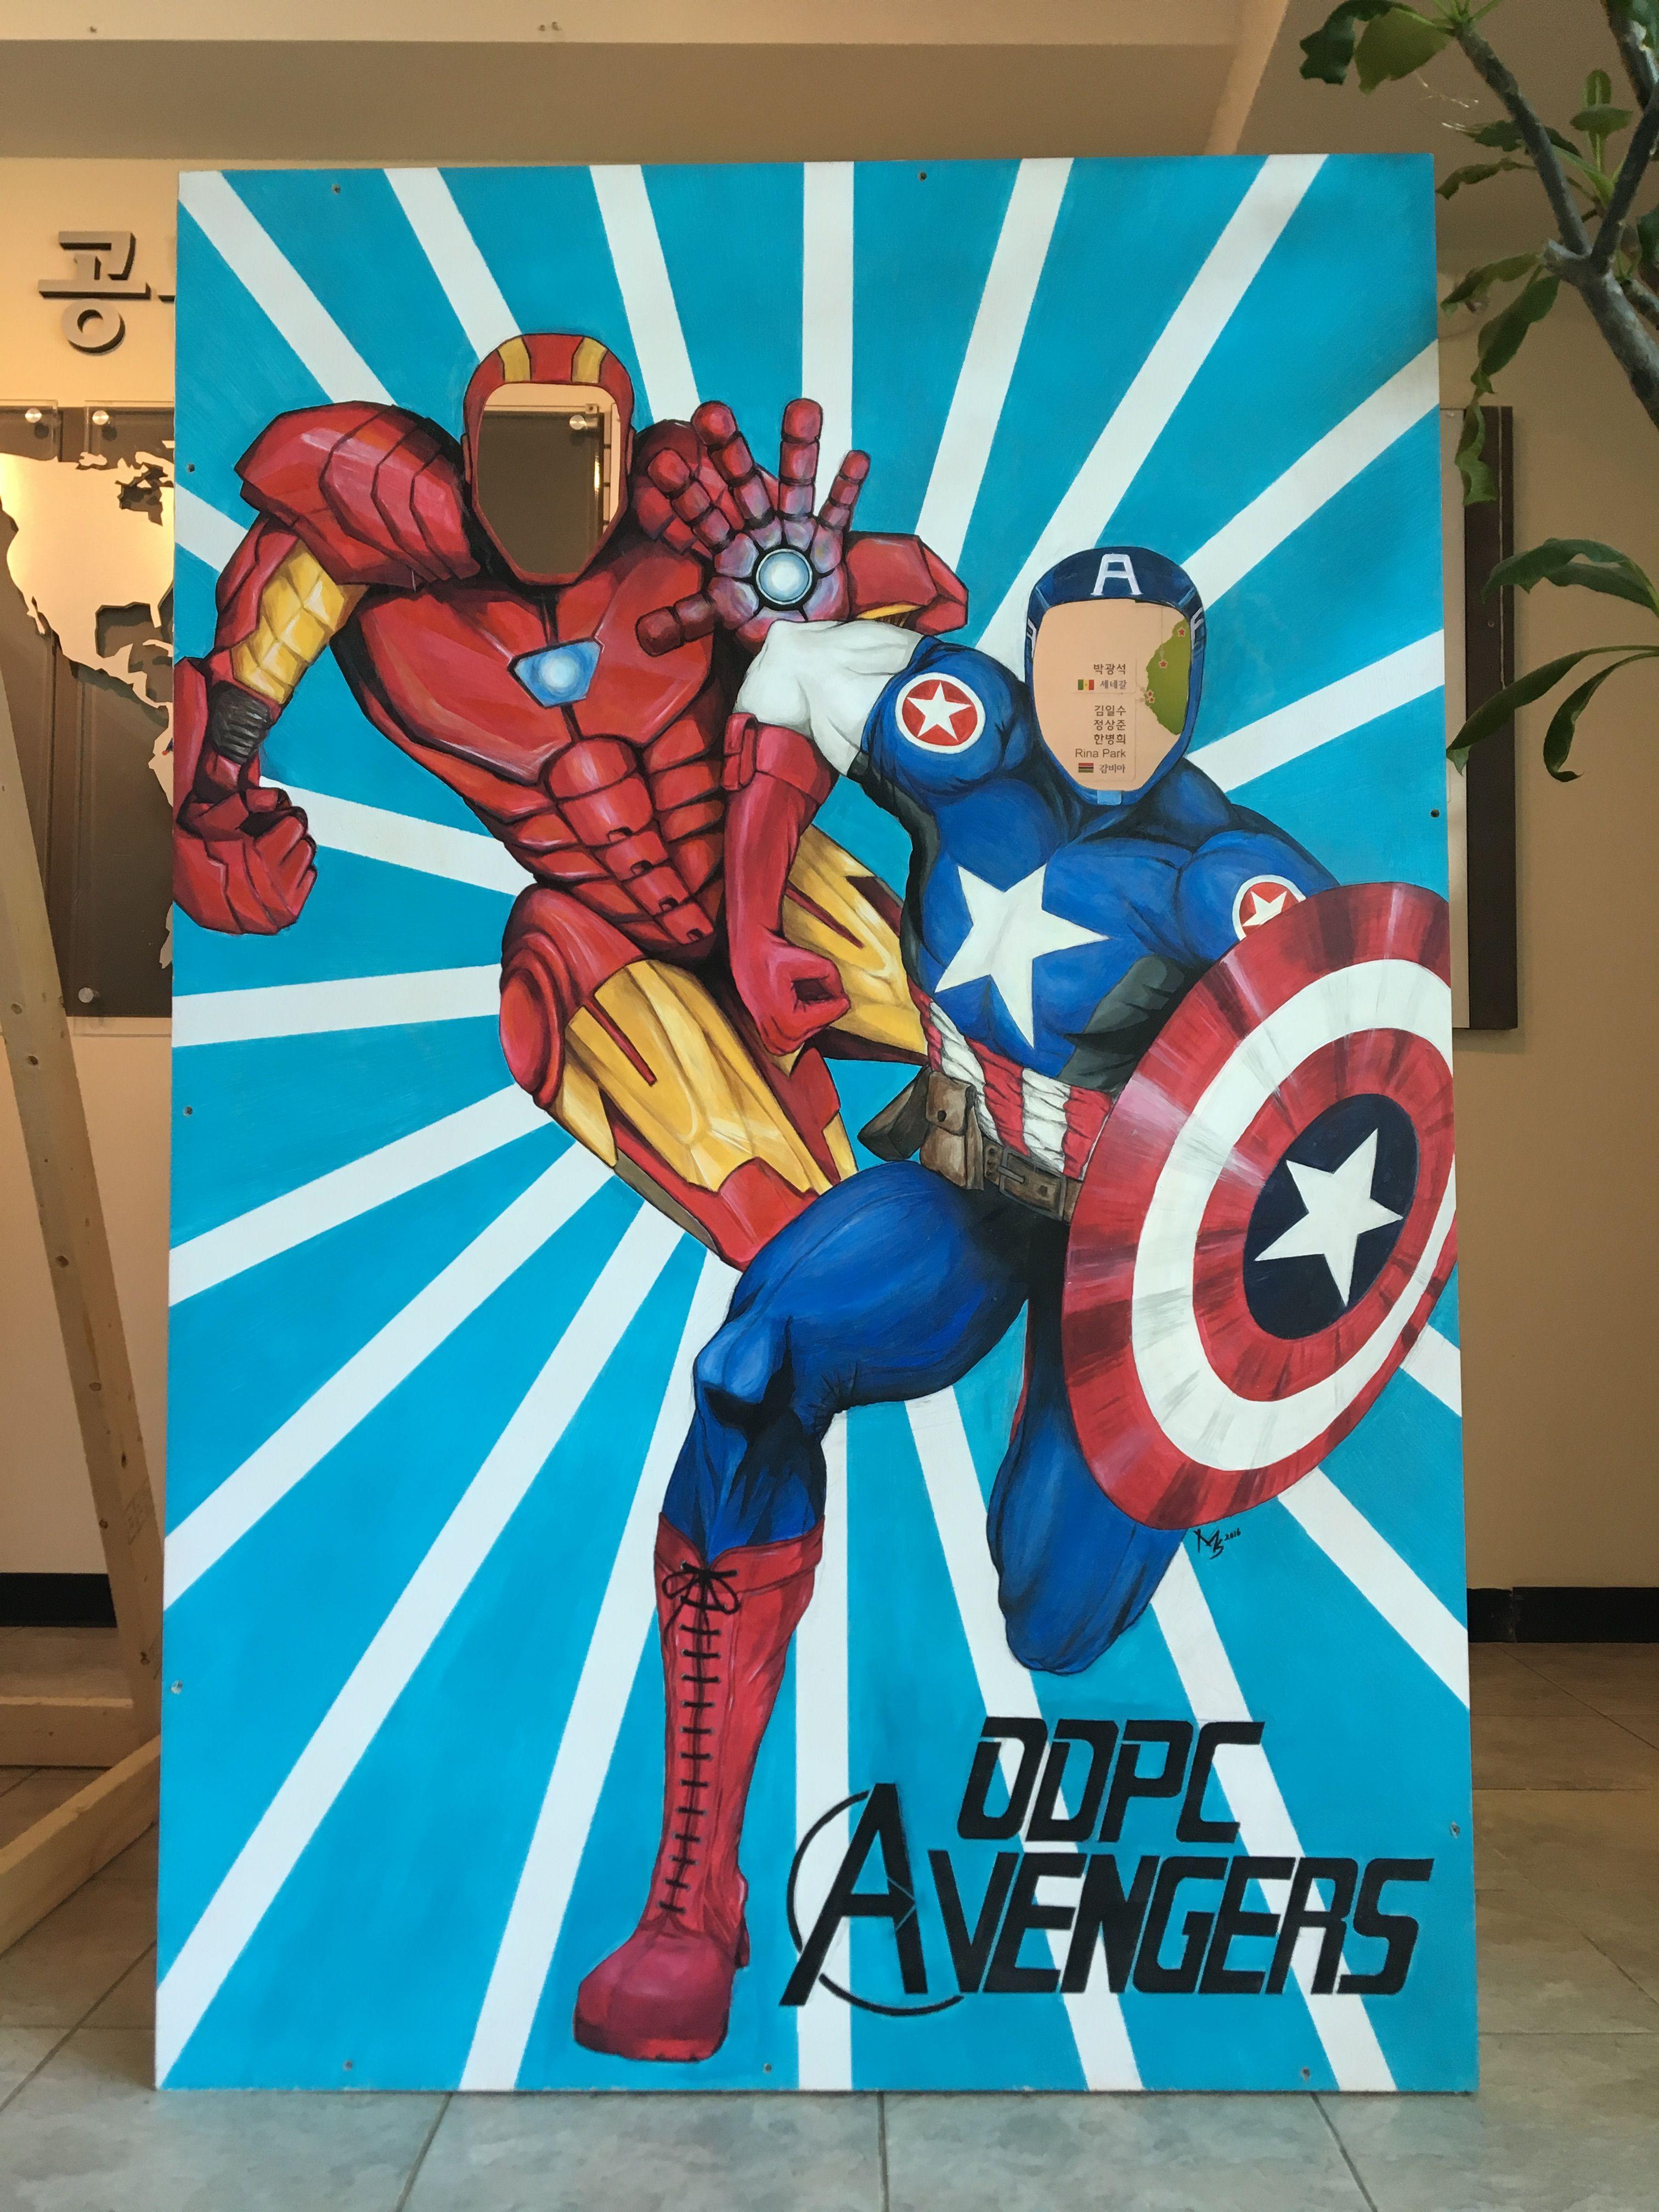 DIY Avengers face in hole photo board for carnival, church